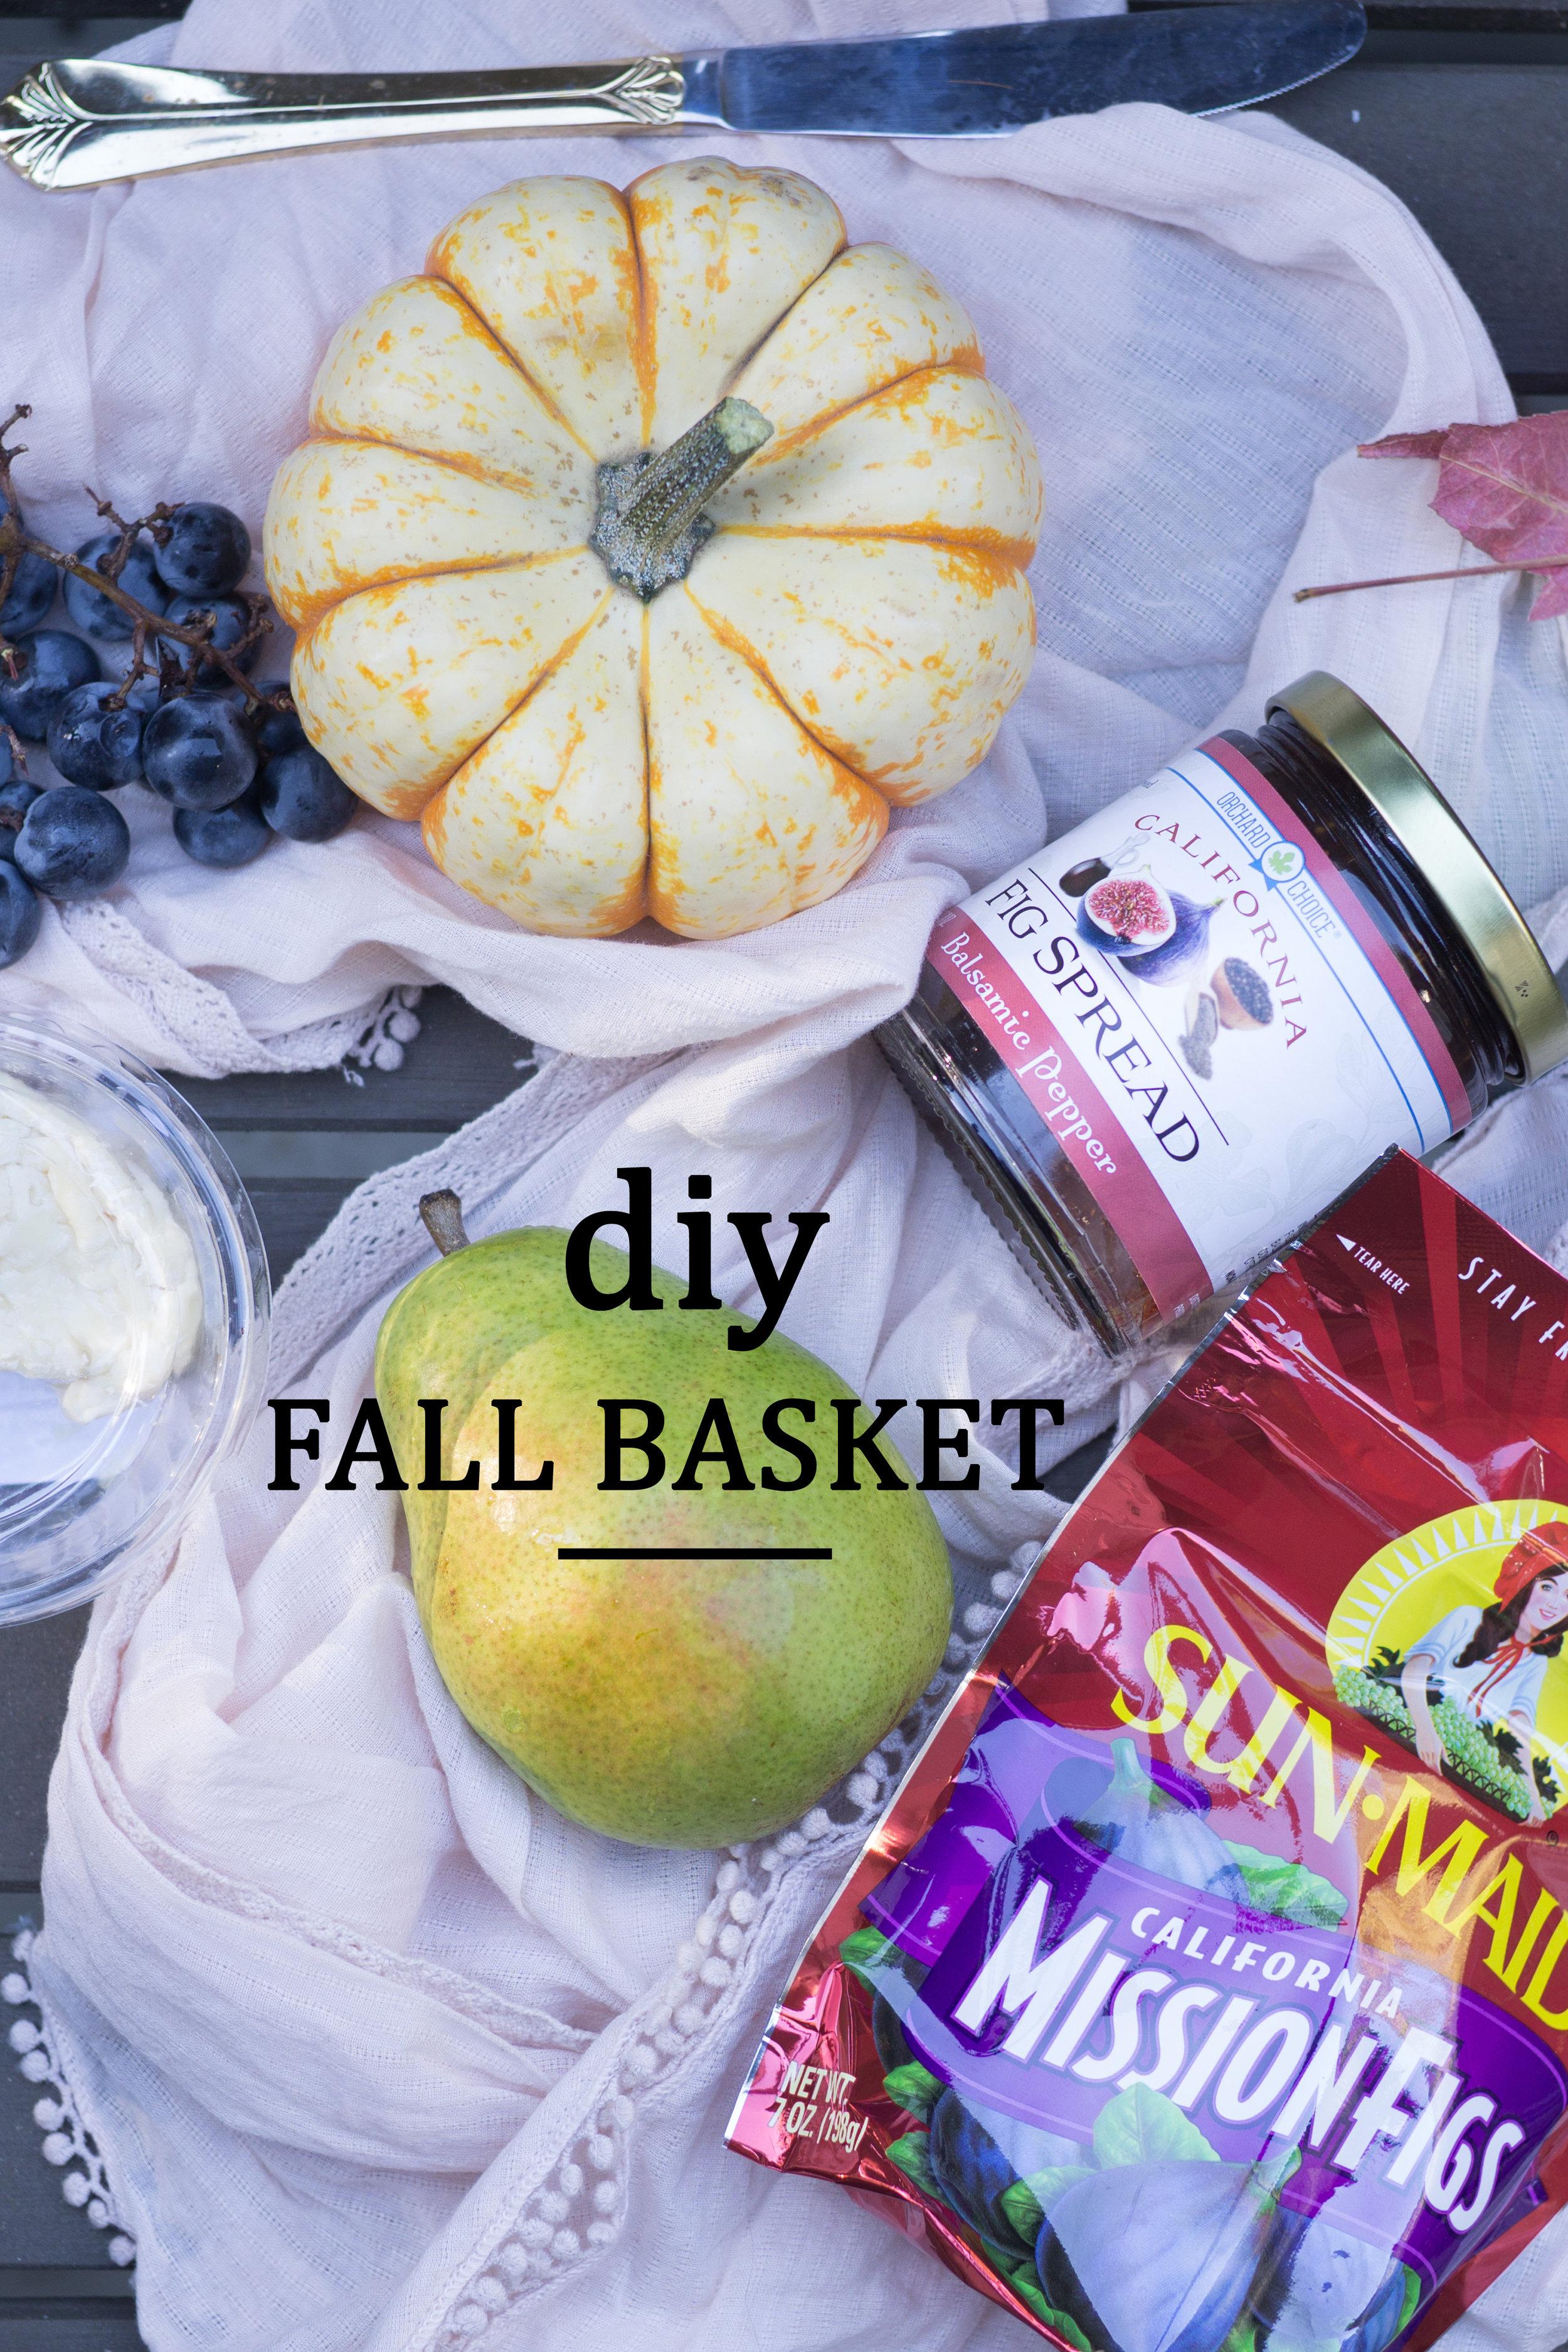 diy-fall-basket